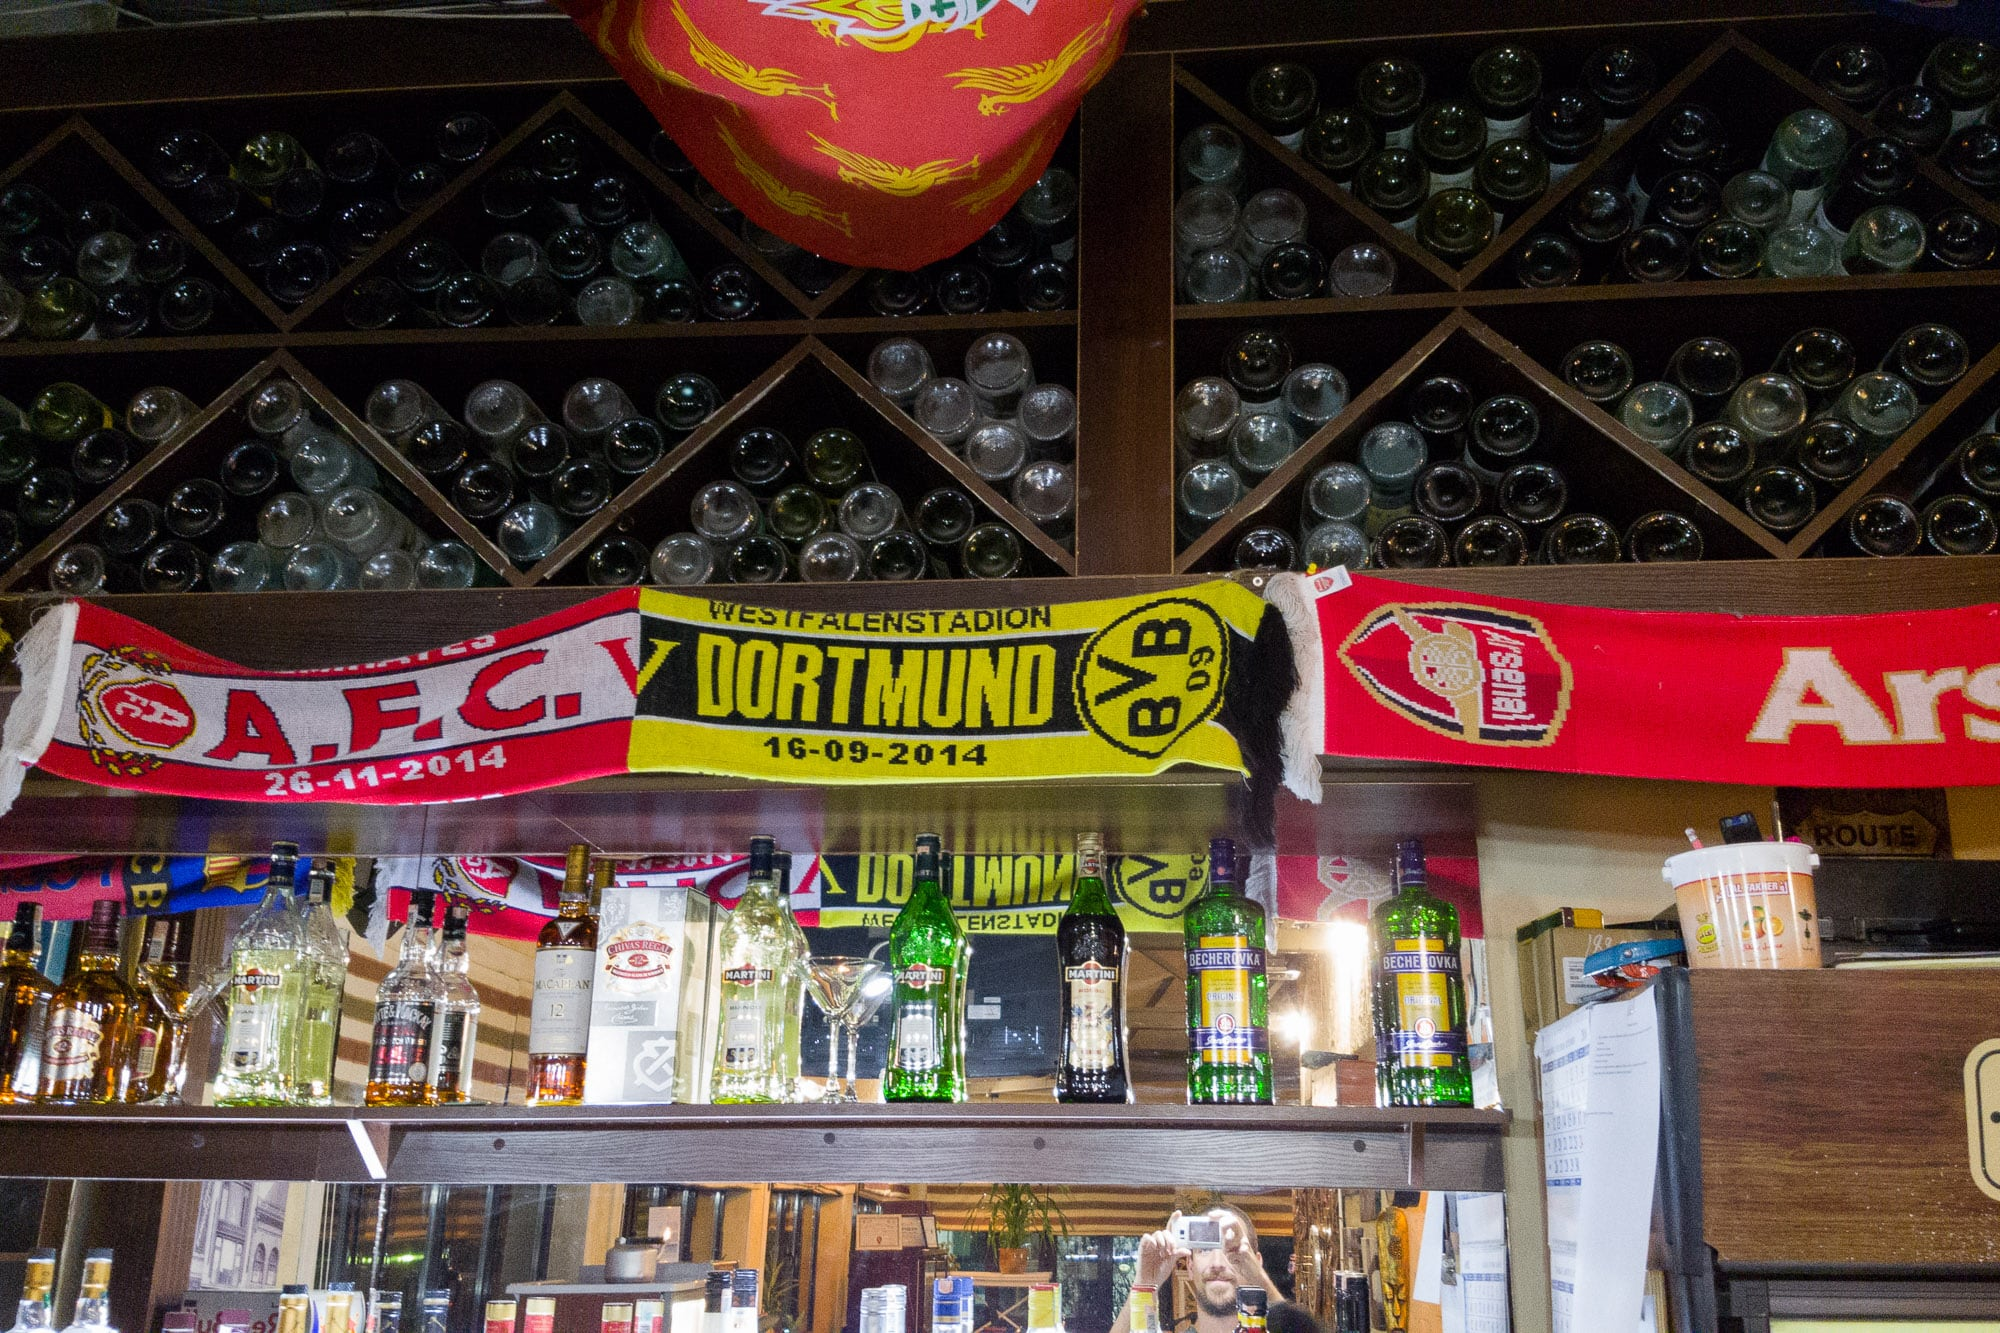 spors bar